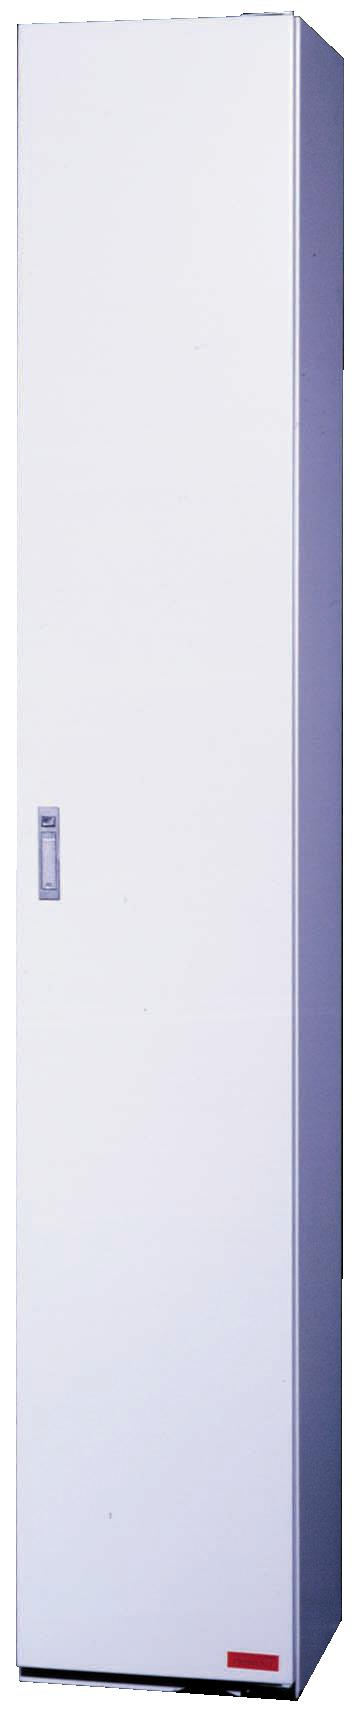 FM-200パッケージ型消火設備 FM-200ユニット Btype